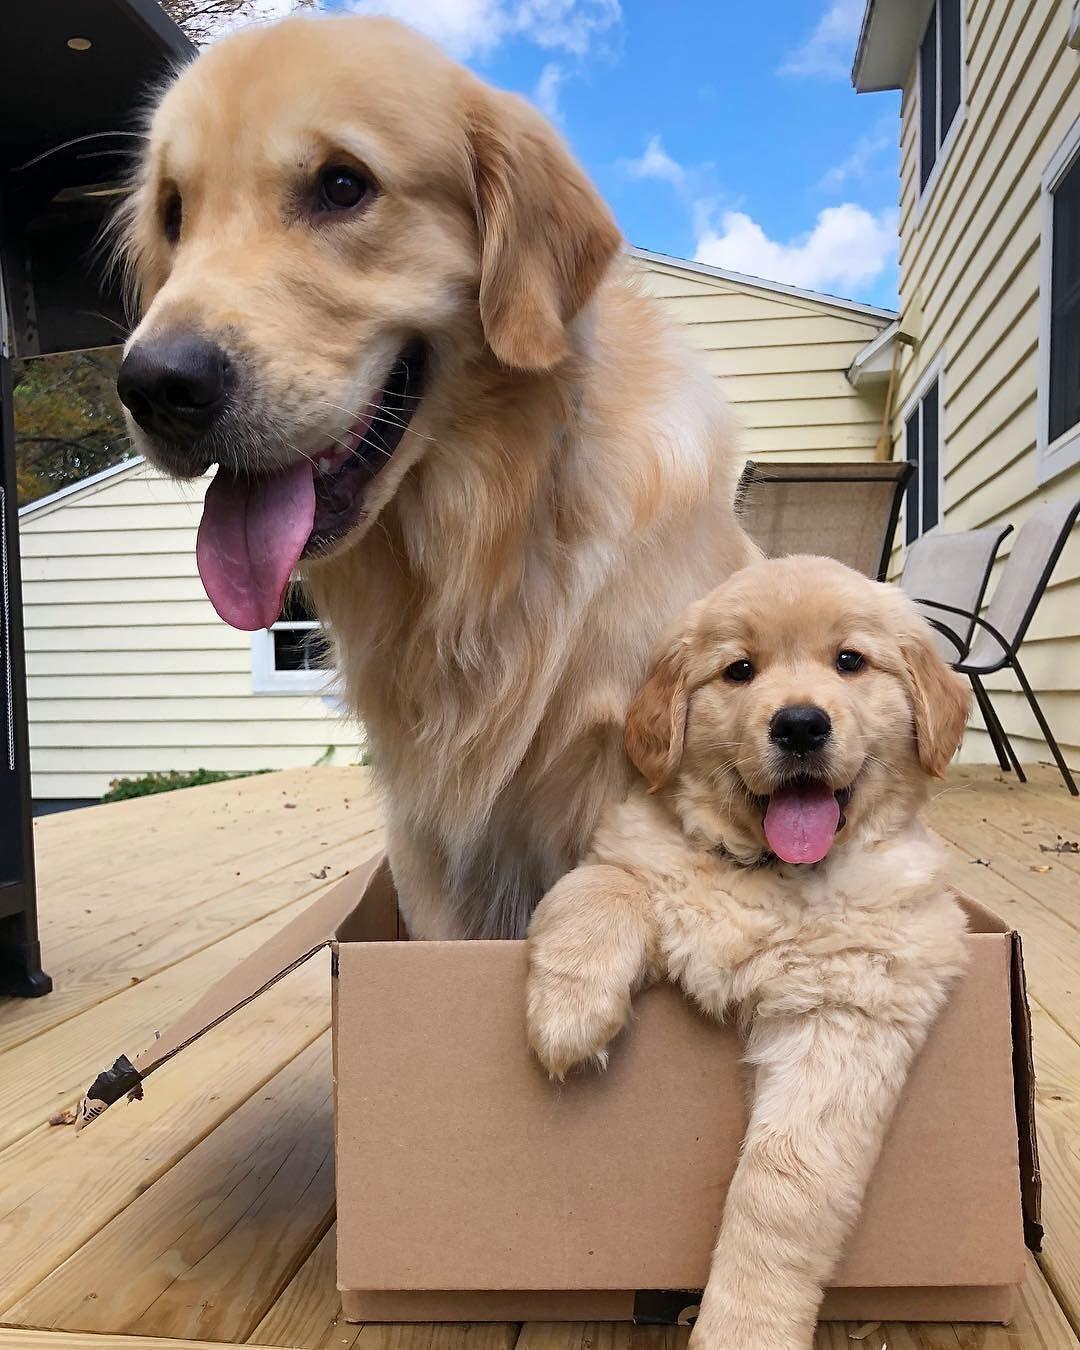 Goldenretriever Dogmom Dogs Puppies Petlove Family Love Cute